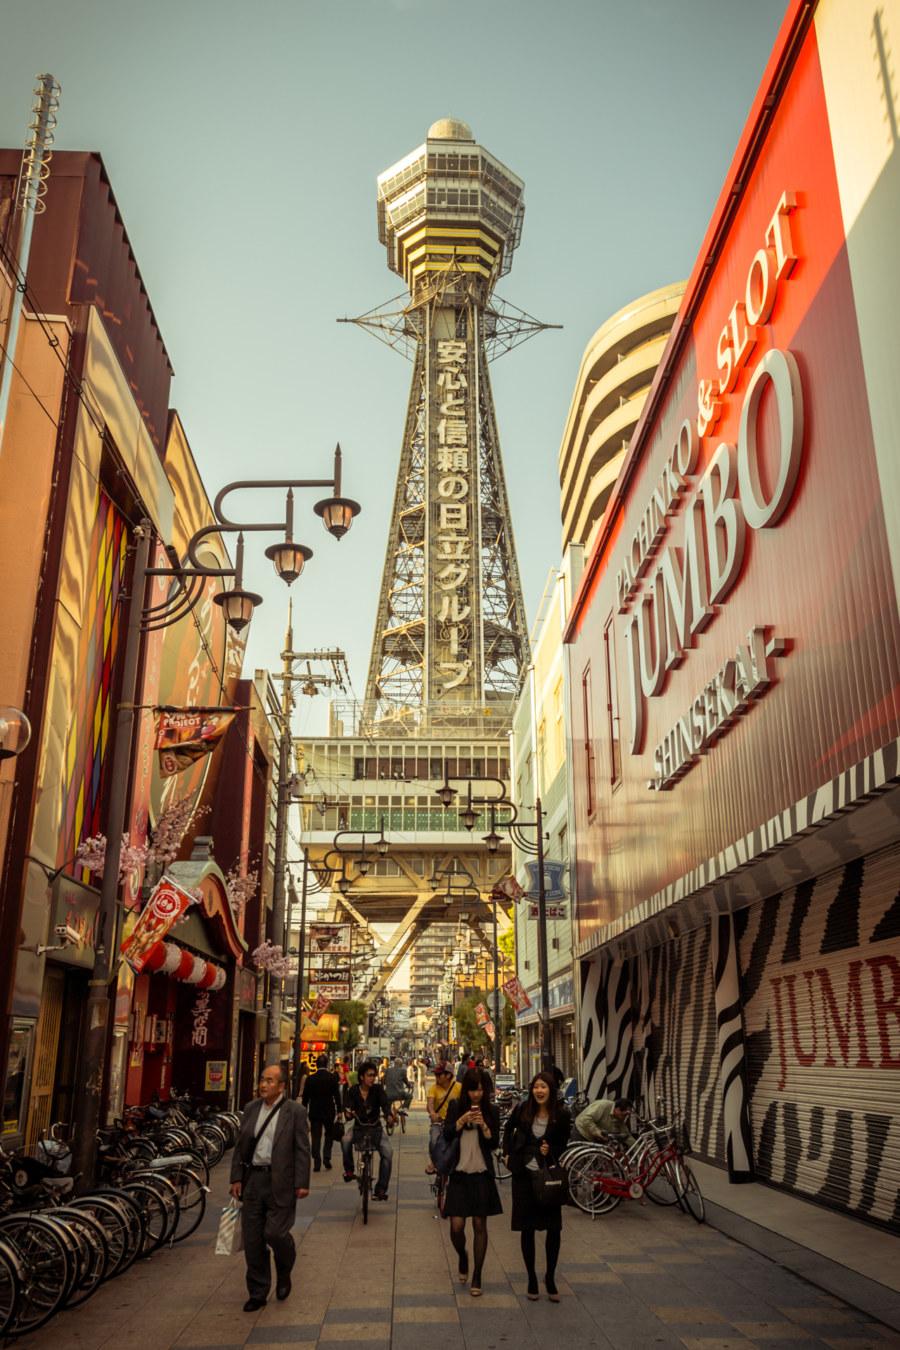 A walk through Shinsekai